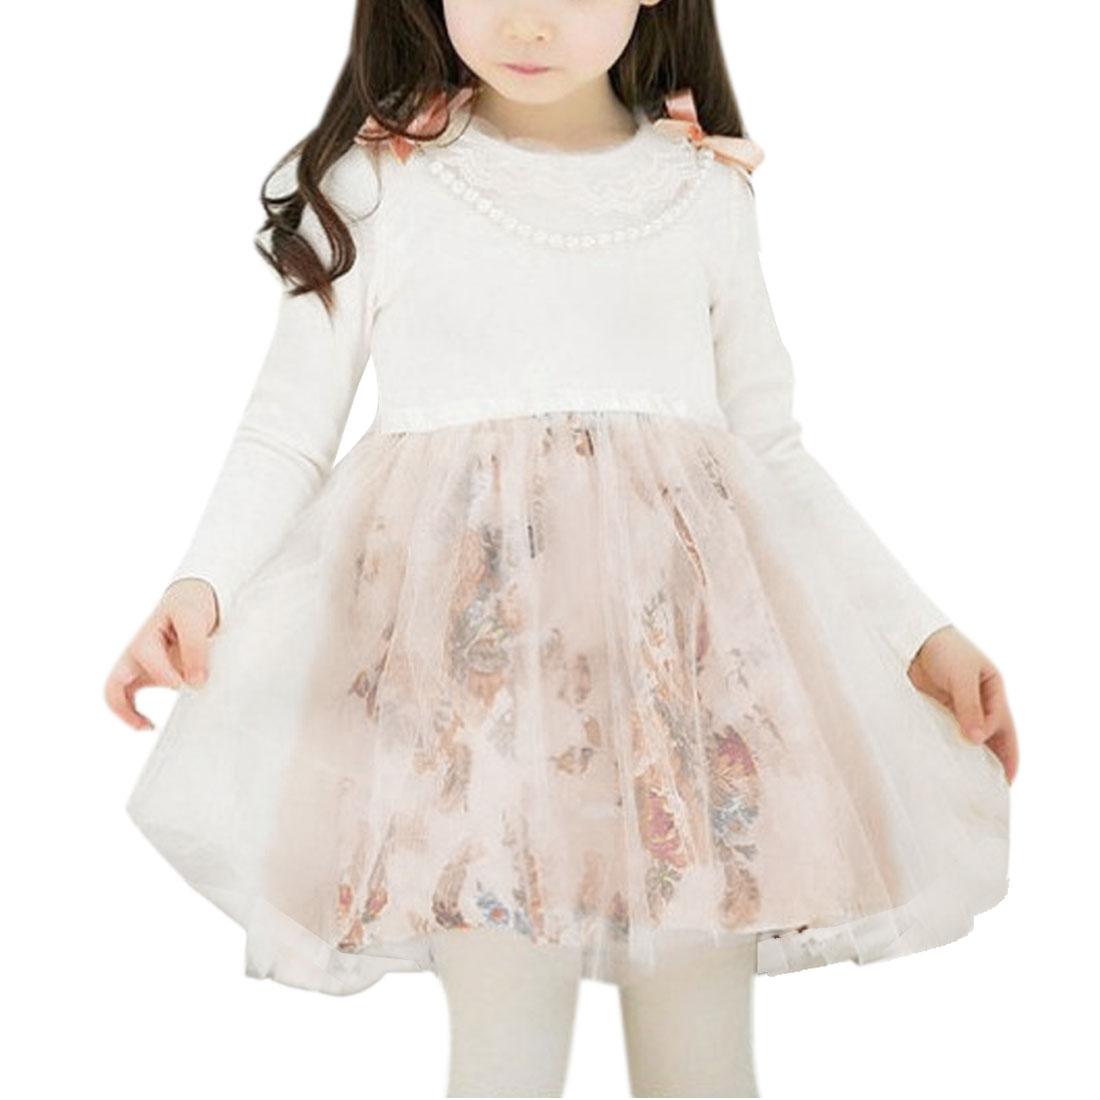 Girls Round Neck Long Sleeve Elastic Waist Fall Dress Pink White 2T